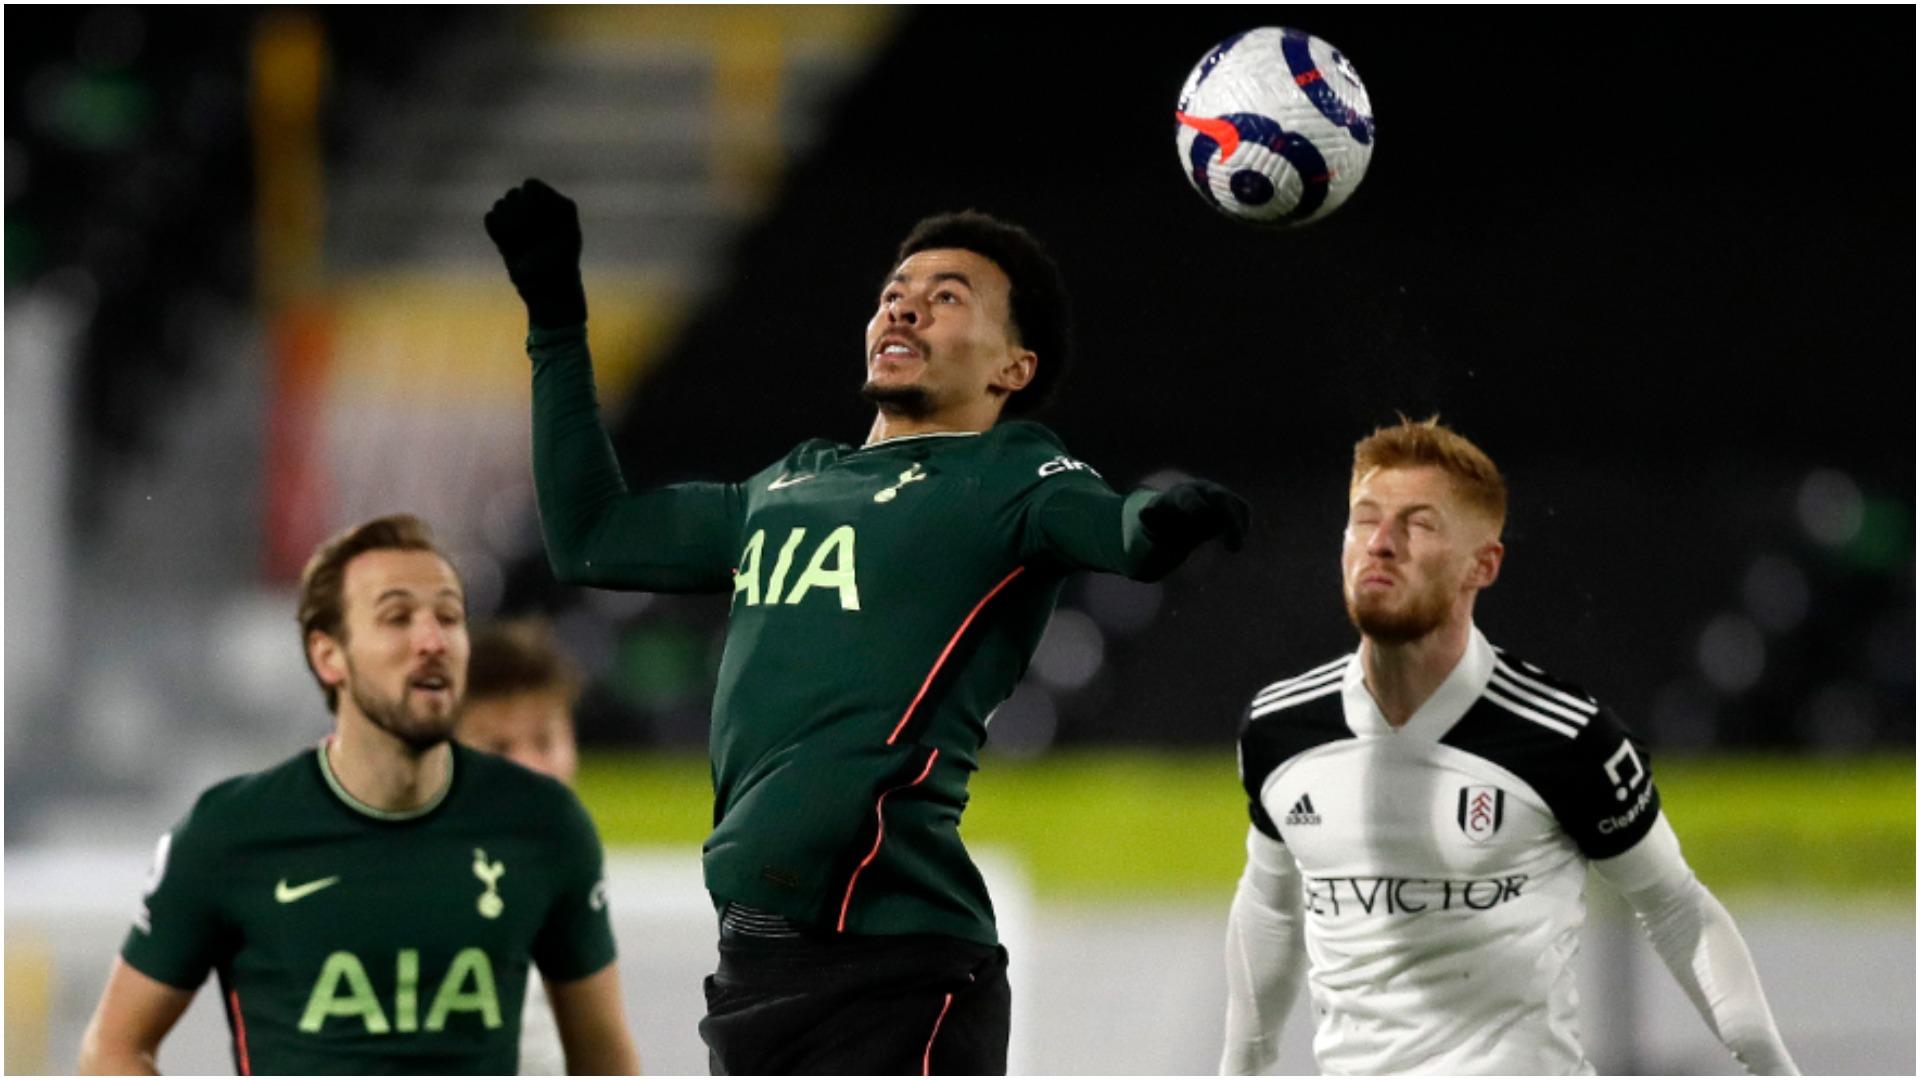 Alli opportunity no 'gift' as Mourinho praises Spurs midfielder